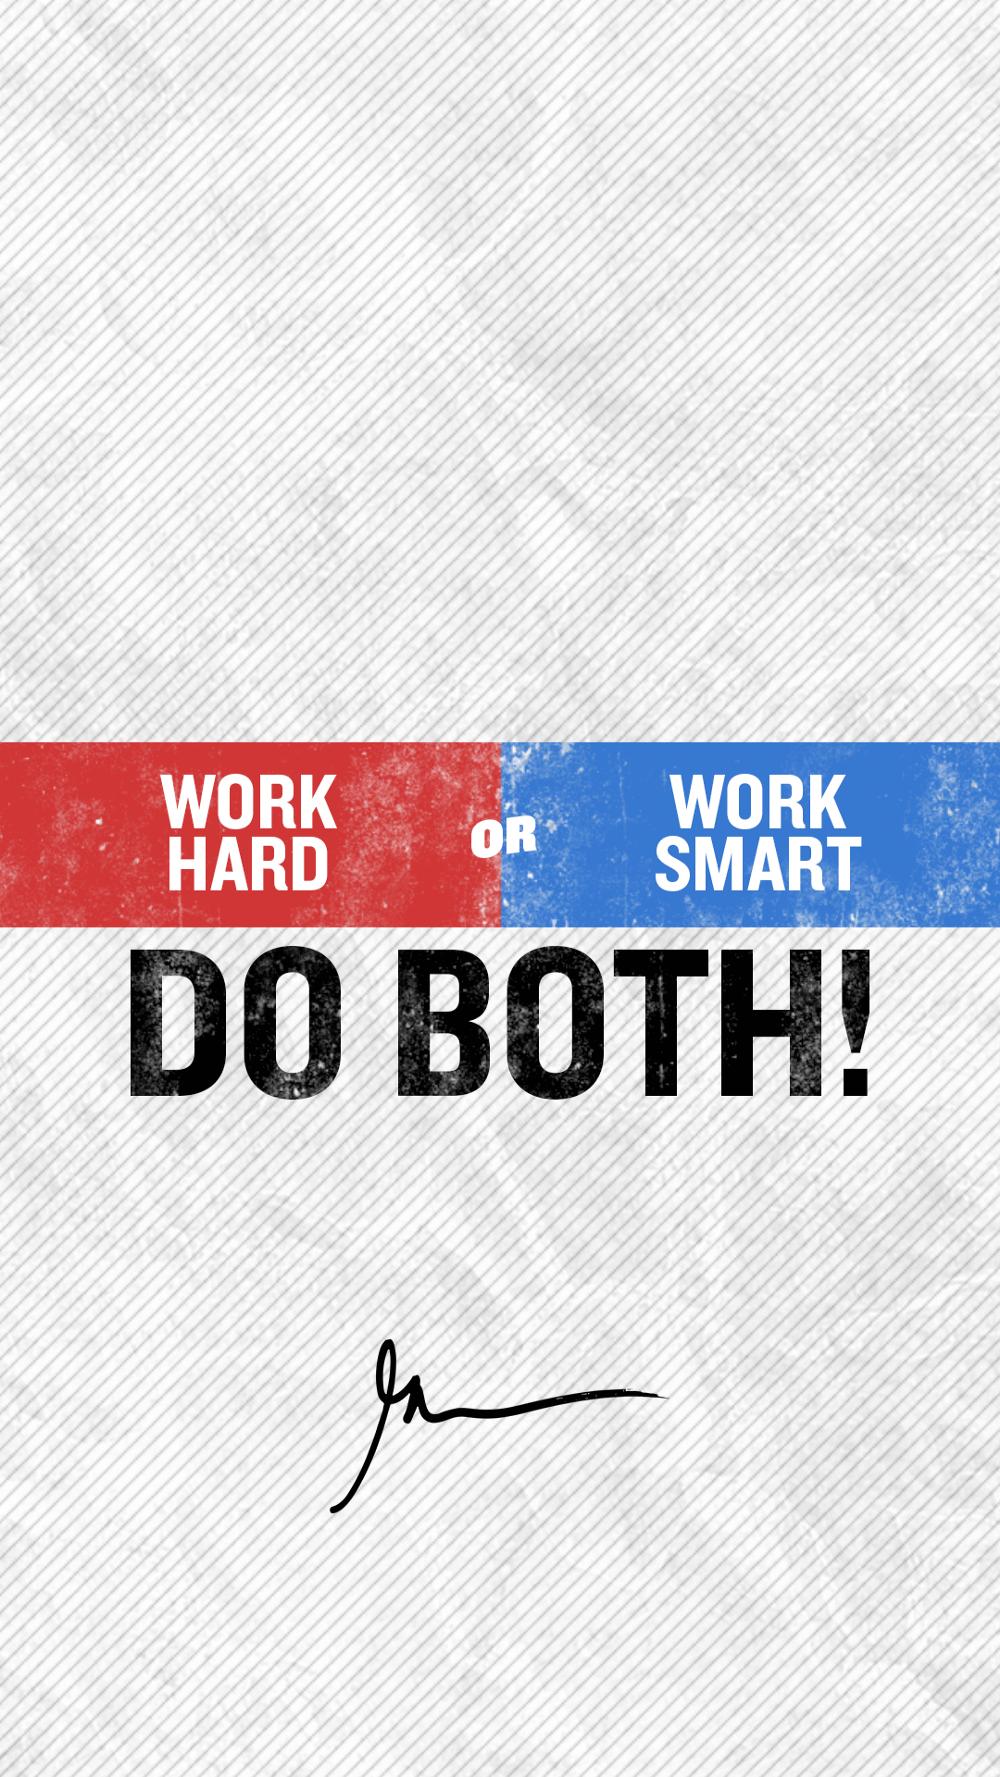 Work Hard Or Work Smart Do Both